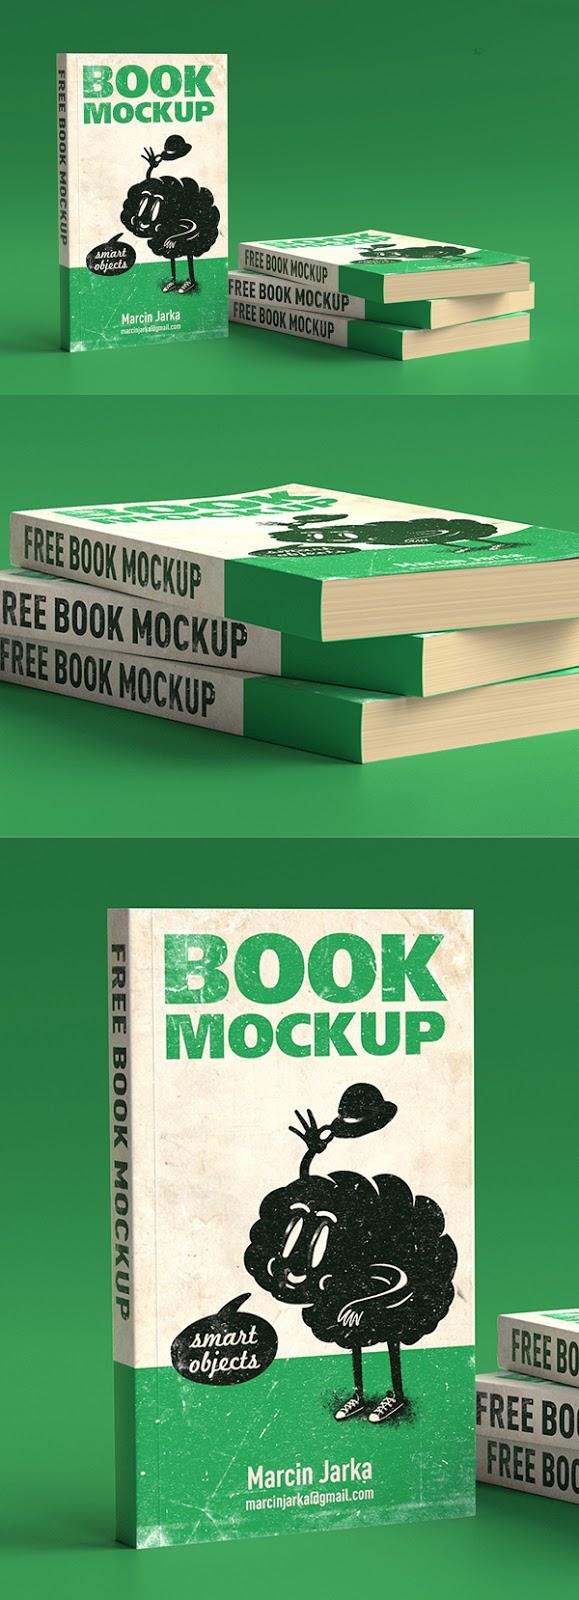 Download Free Mockup PSD 2018 - Free Book Mockup PSD Templates